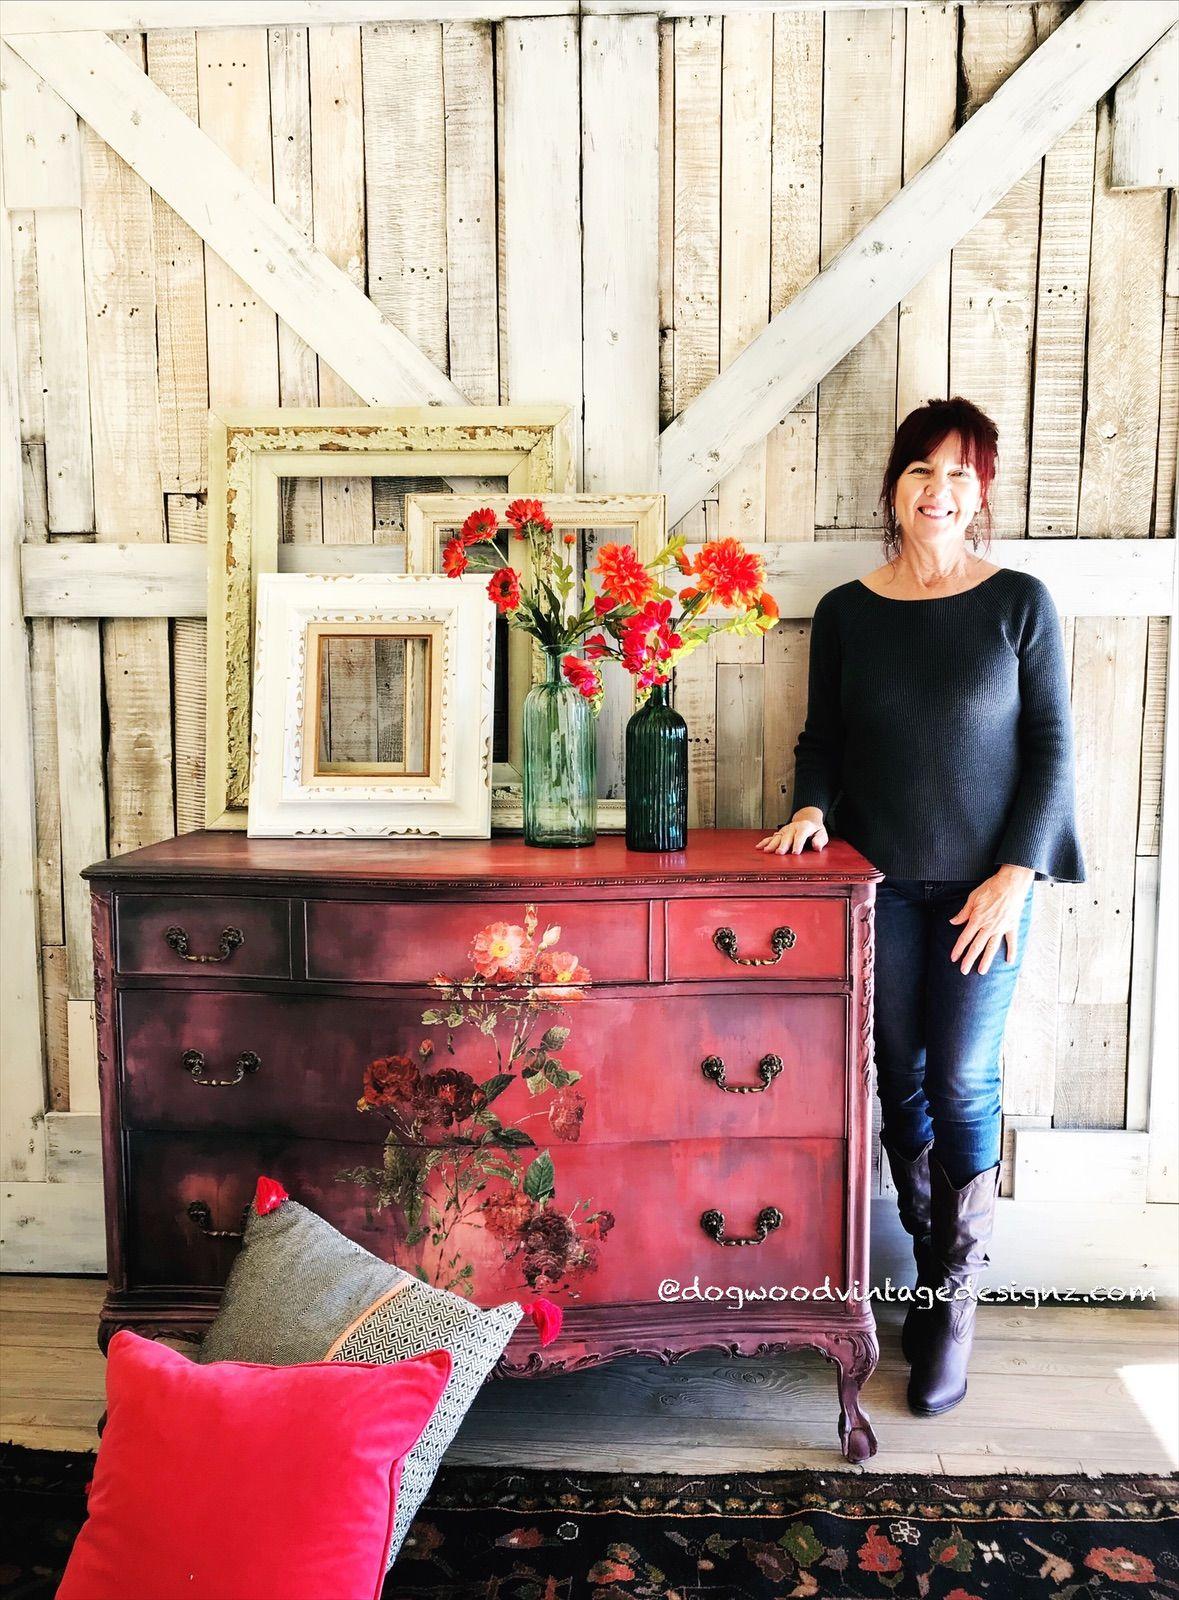 #rusticelegance #art #furniturepainting #handmade #classy #shopsmall #interiors #rustic #furnitureflip #farmhousedecor #frenchantiques #handpainted #refurbishedfurniture #reuse #diyhomedecor #woodworking #antiquefurniture #anniesloan #diypaint #paintedfurniture #chalkpaint #painteddresser #cottagestyle #frenchprovincial #colormovement #blendedpainting #lovemyjob #georgiagirl #handcrafted #custommade